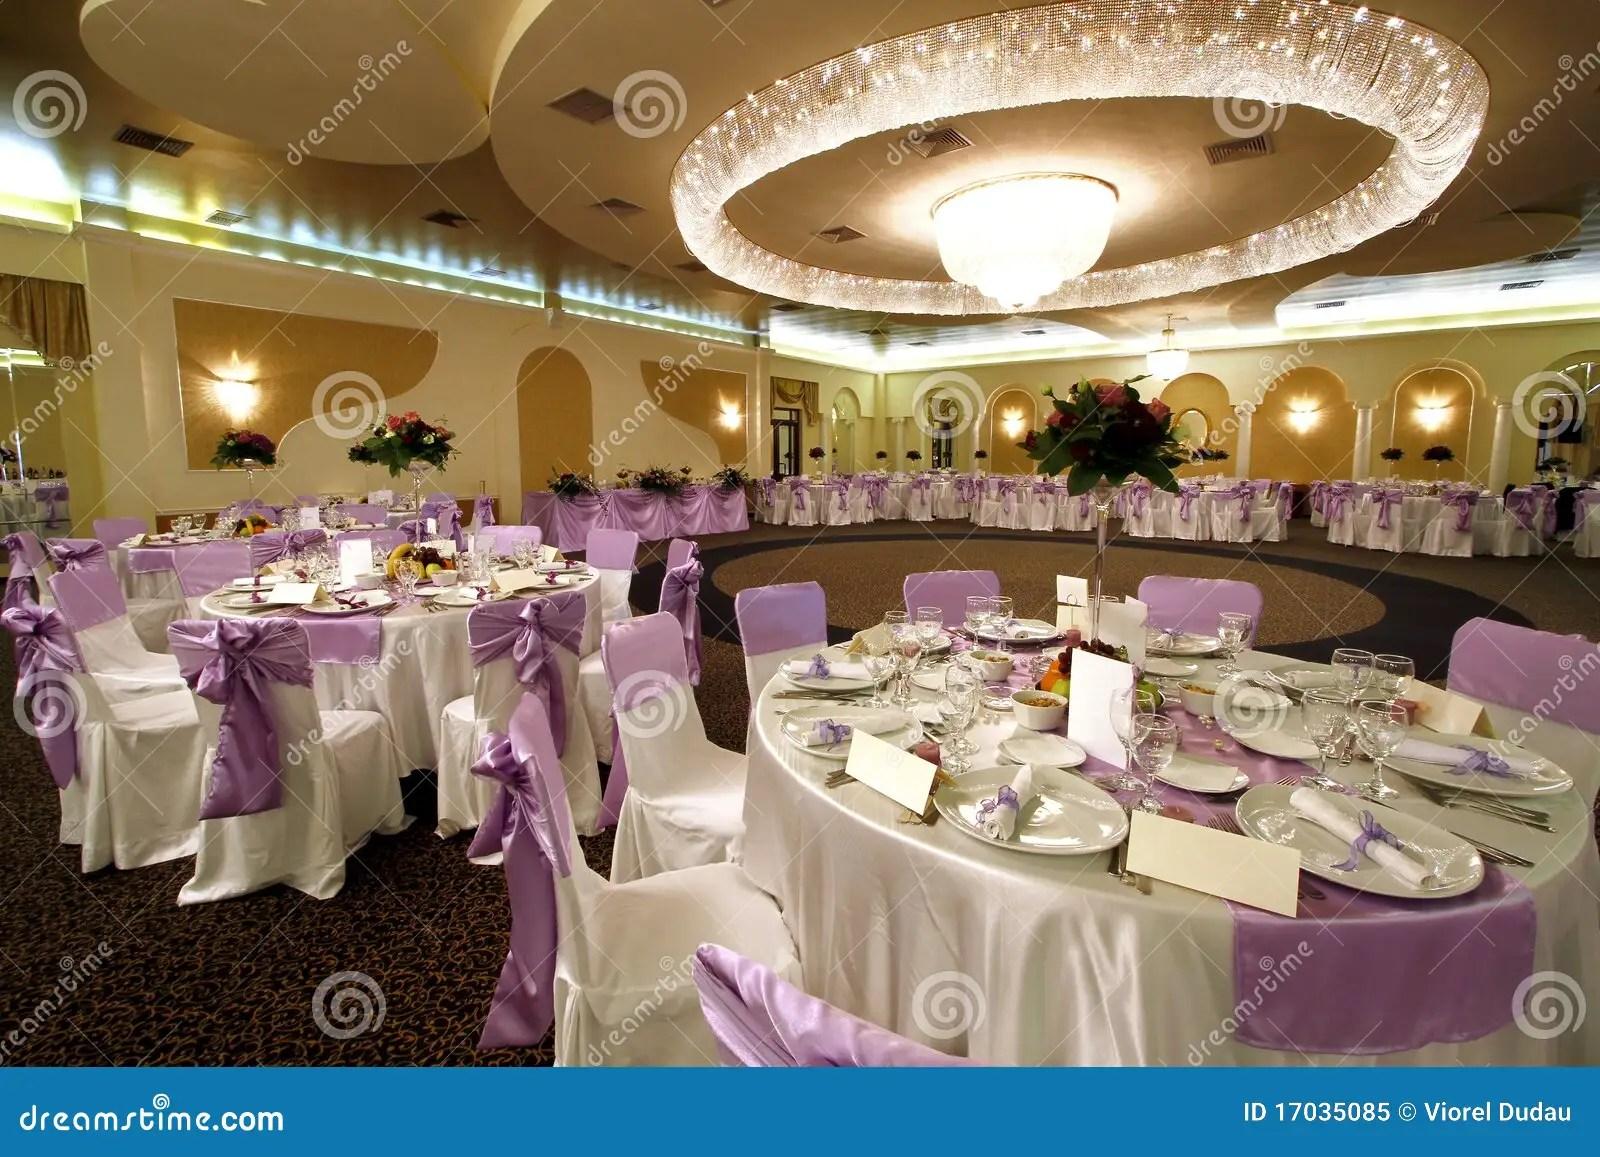 Wedding Or Banquet Ballroom Stock Image  Image of chair